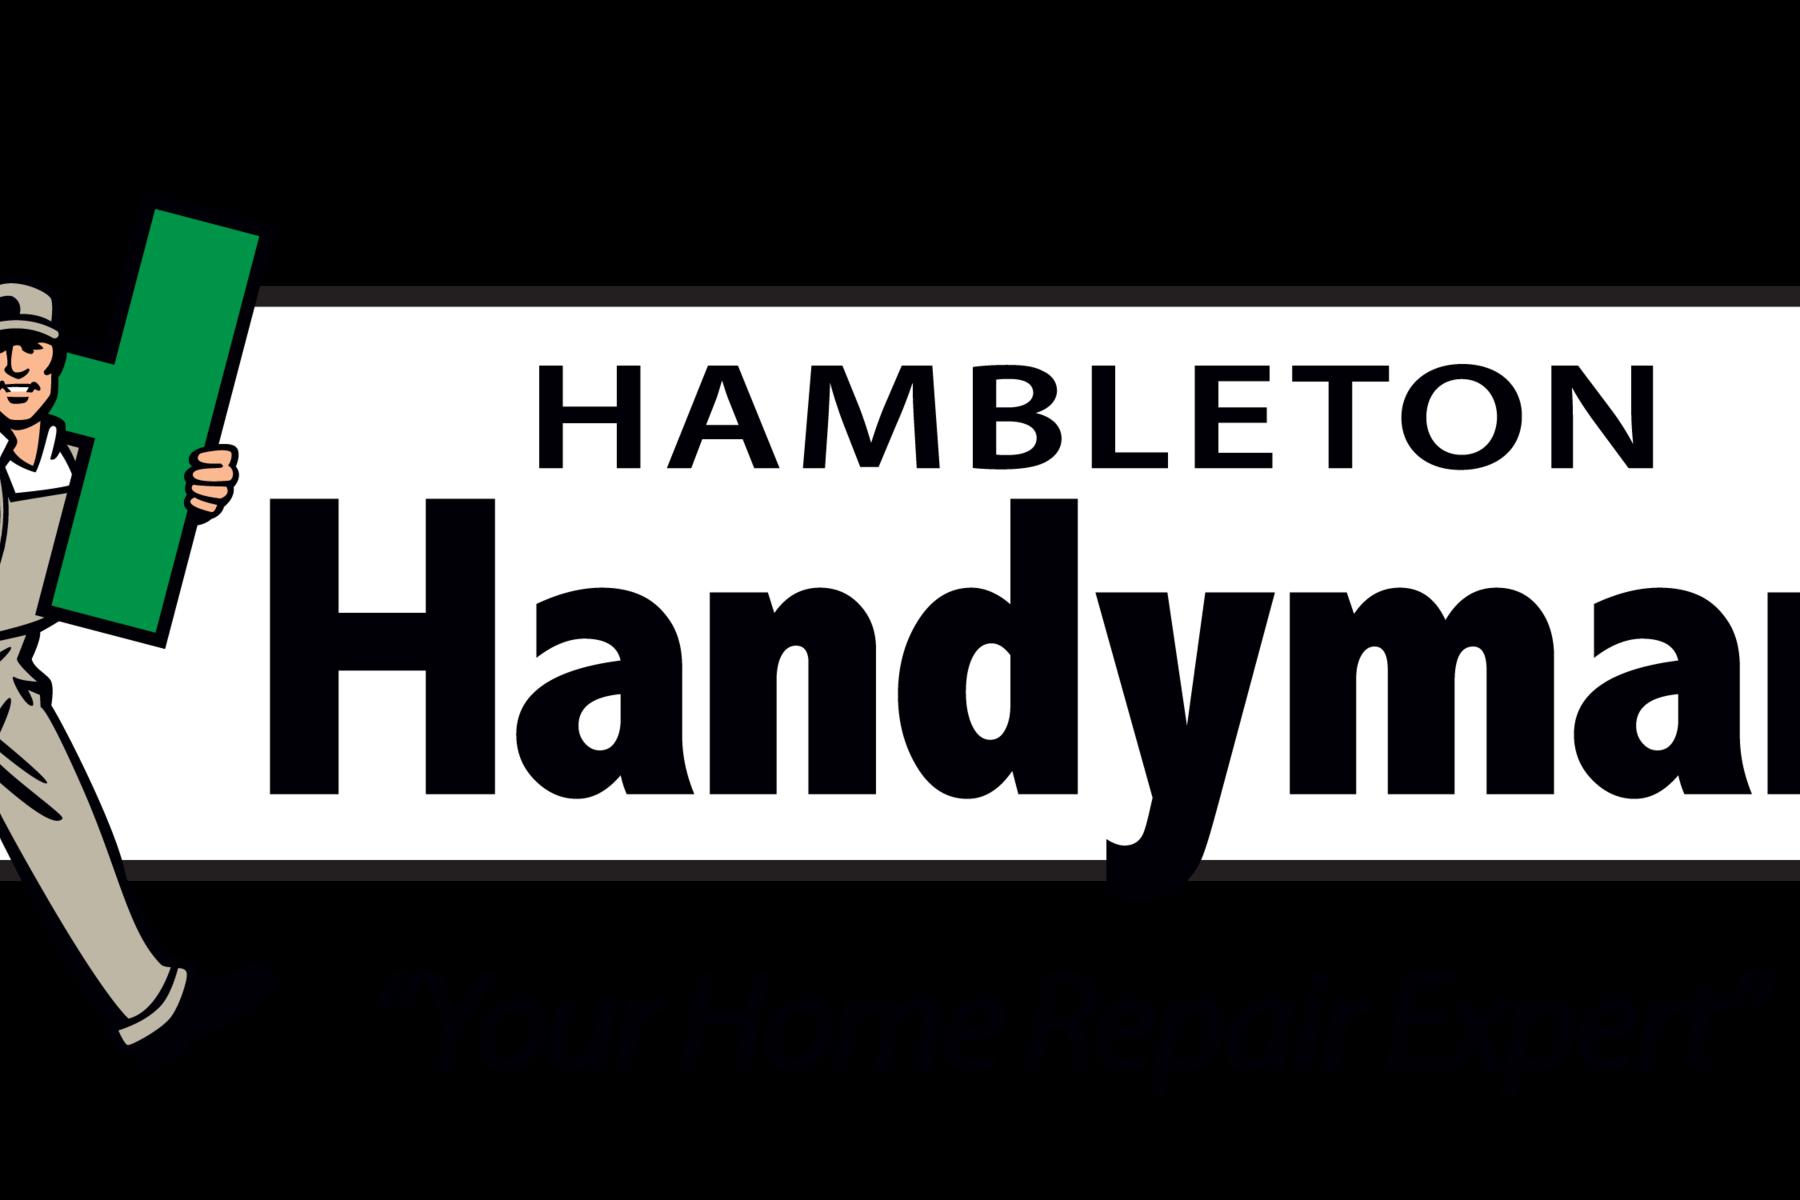 Hhandyman logo